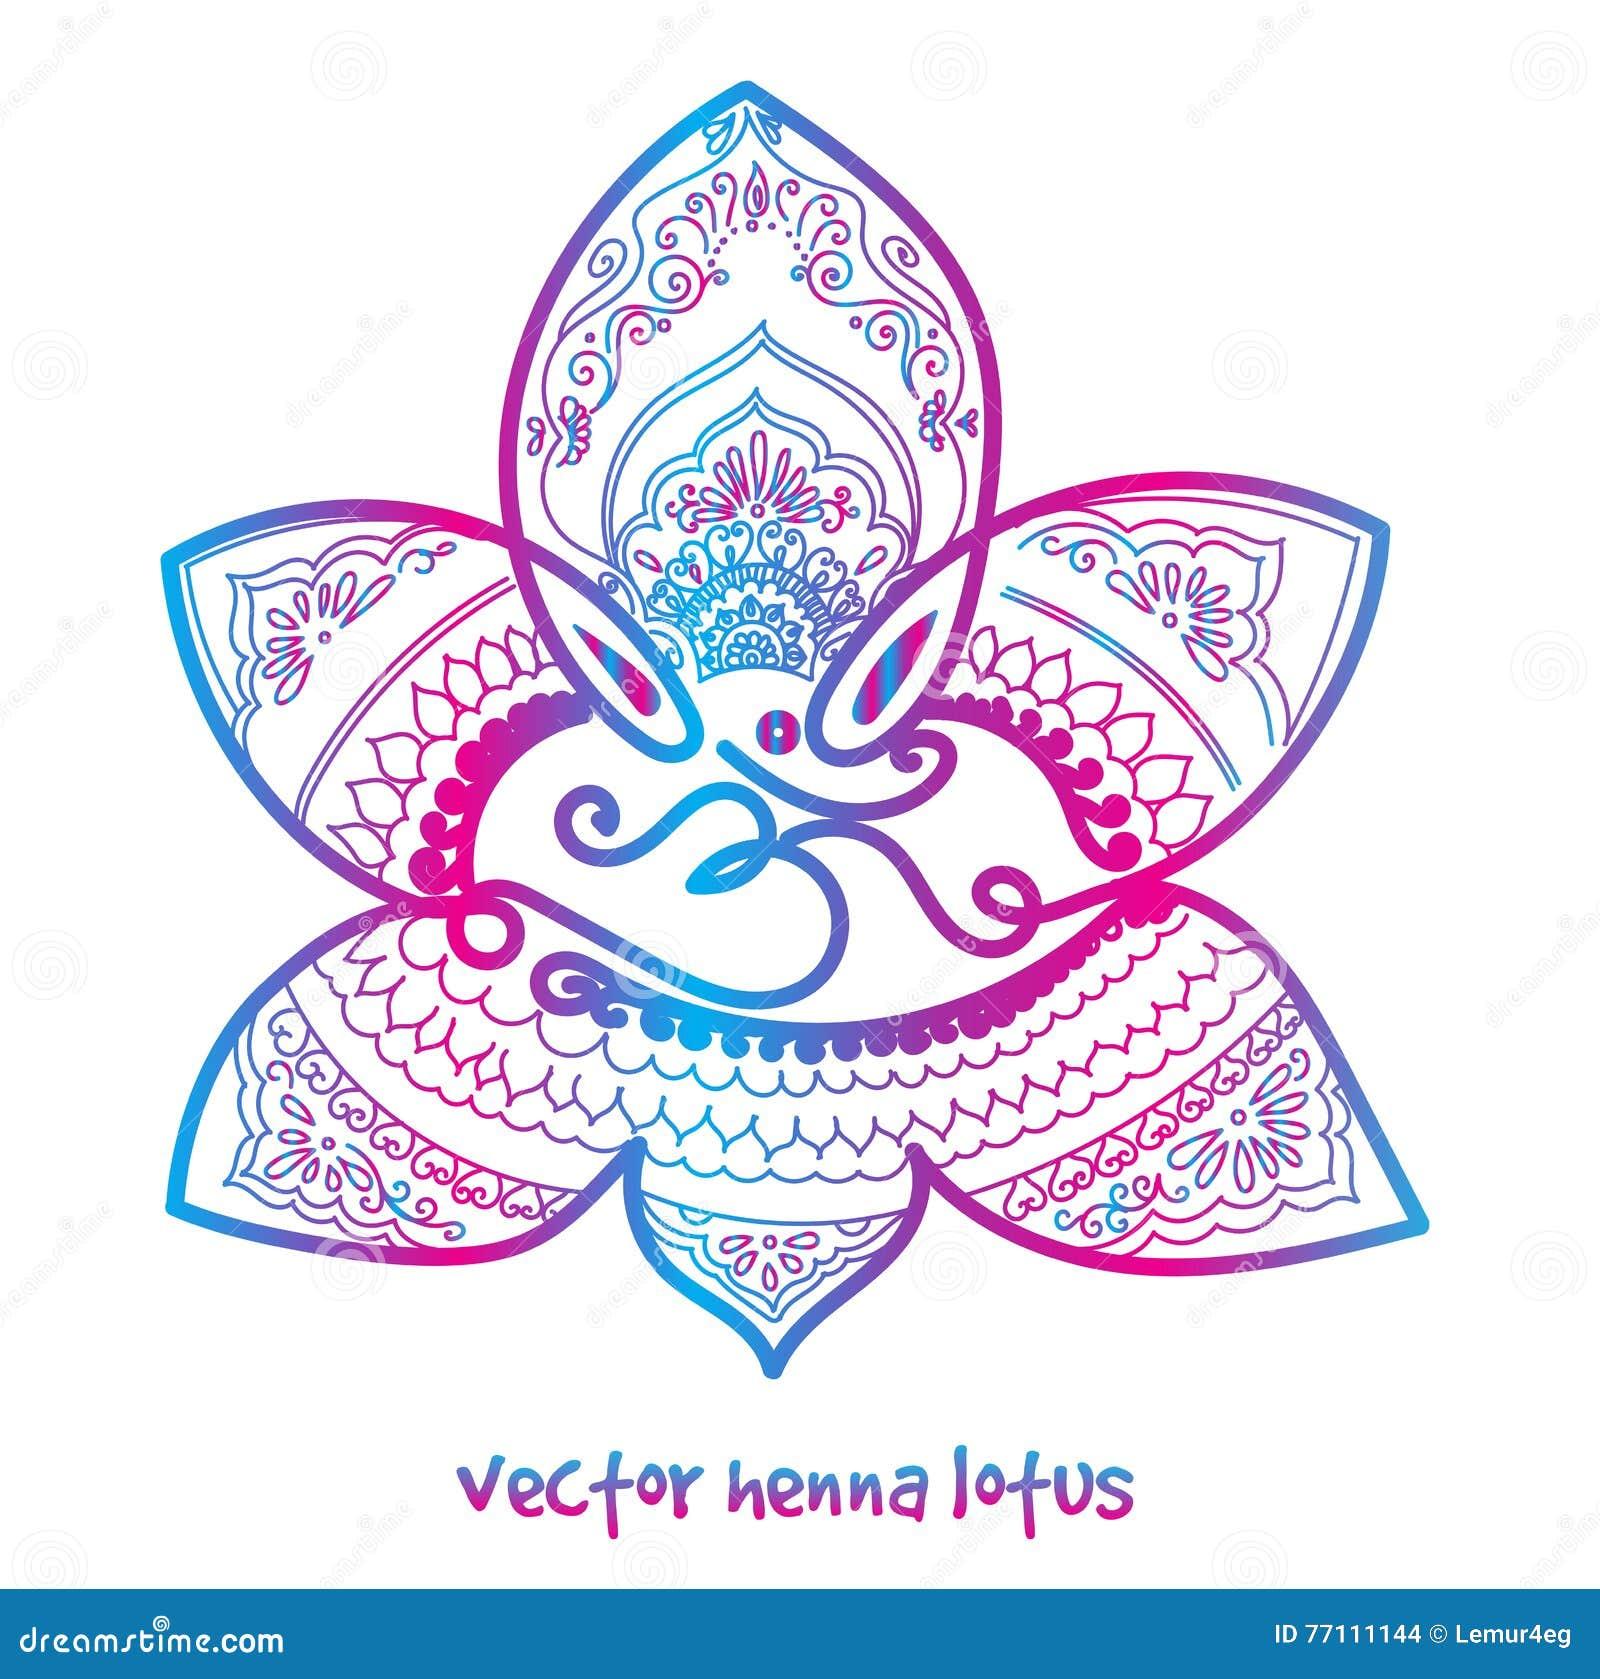 Tattoo Henna Lotus Stock Photo Image Of Mehendi Abstract 77111144